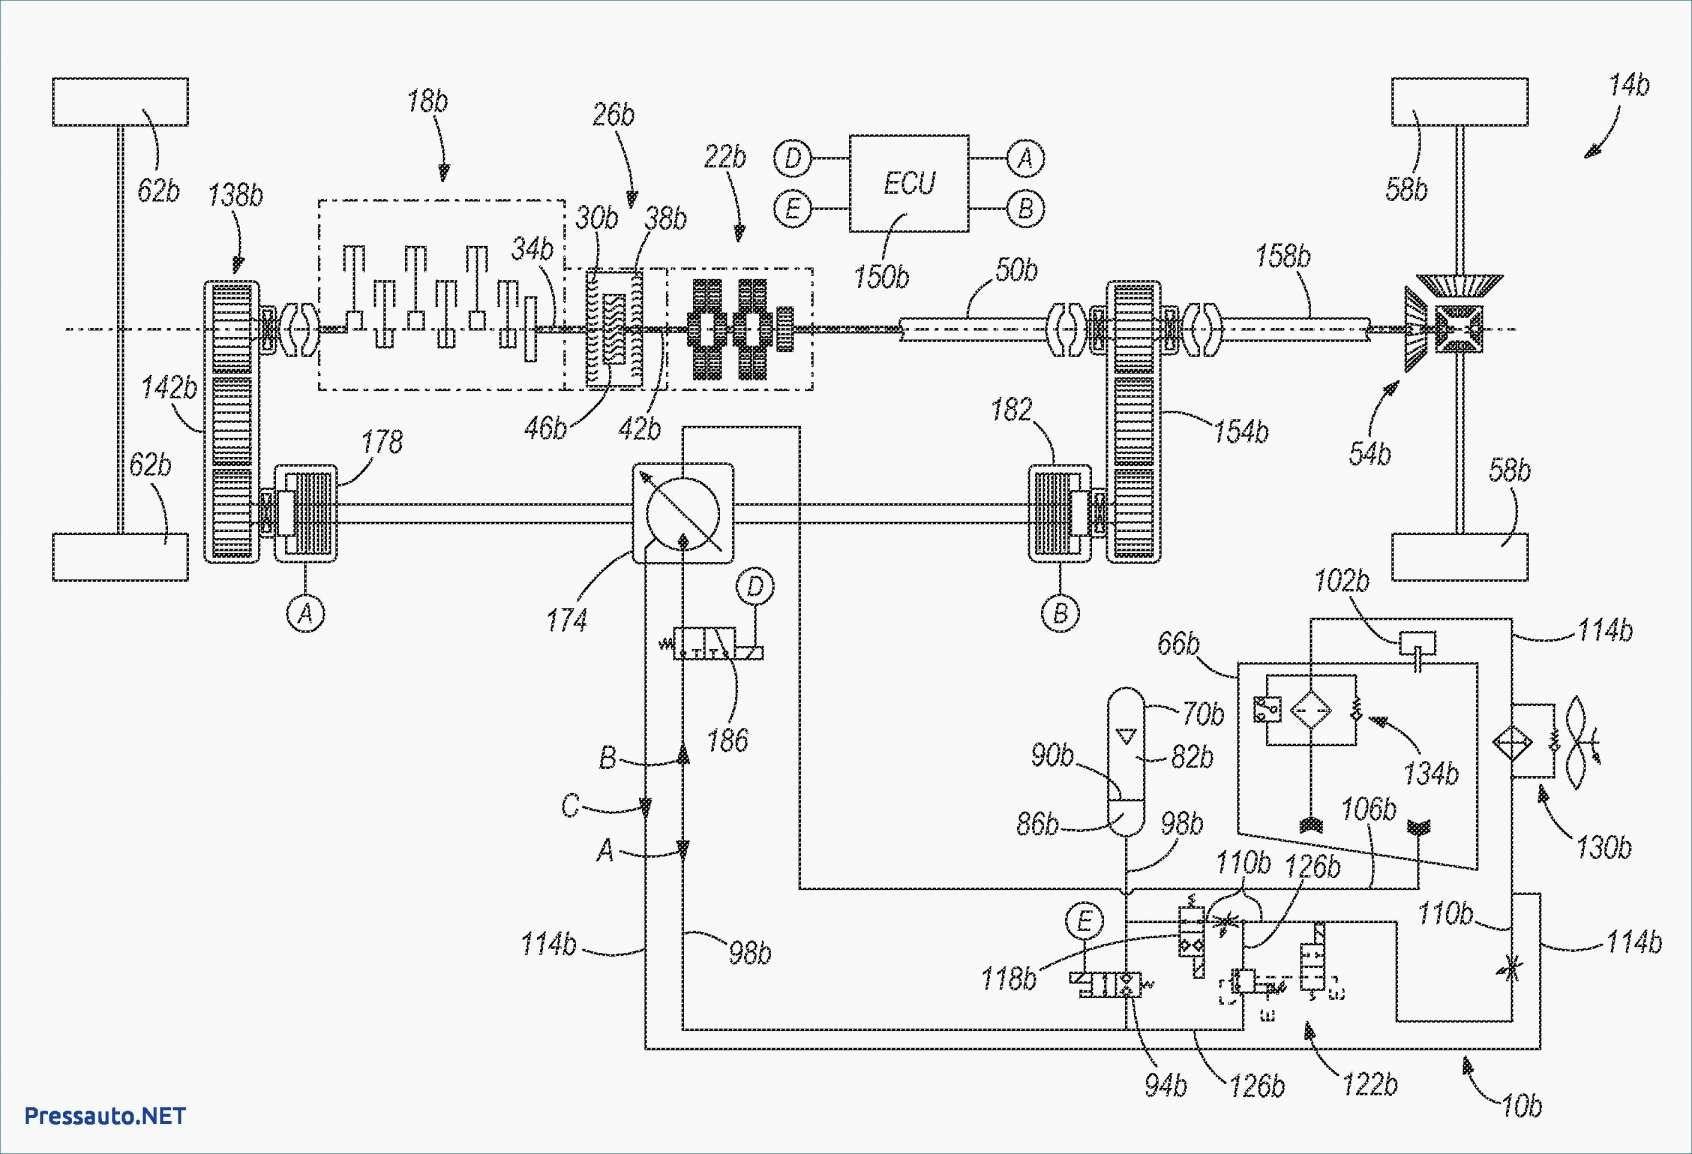 10 1998 International Truck Wiring Diagram Truck Diagram Wiringg Net Diagram Trailer Wiring Diagram International Truck